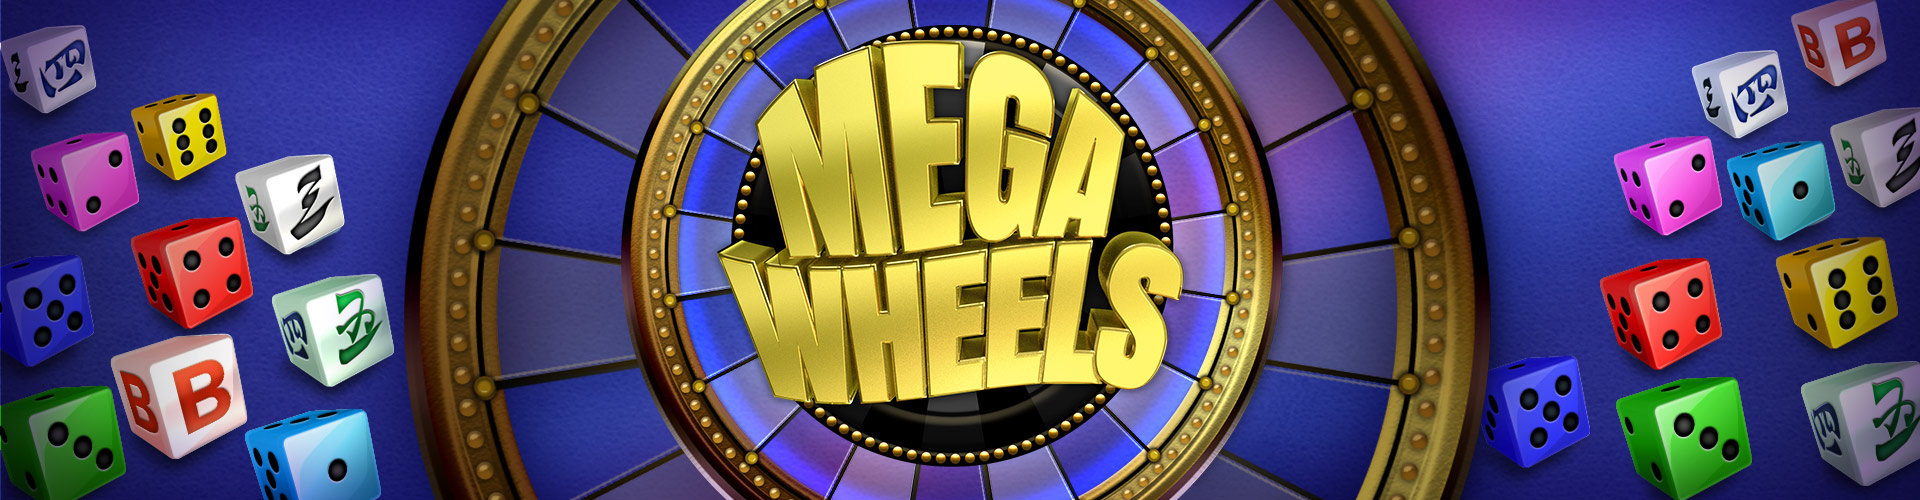 Mega Wheels - betFIRST Casino